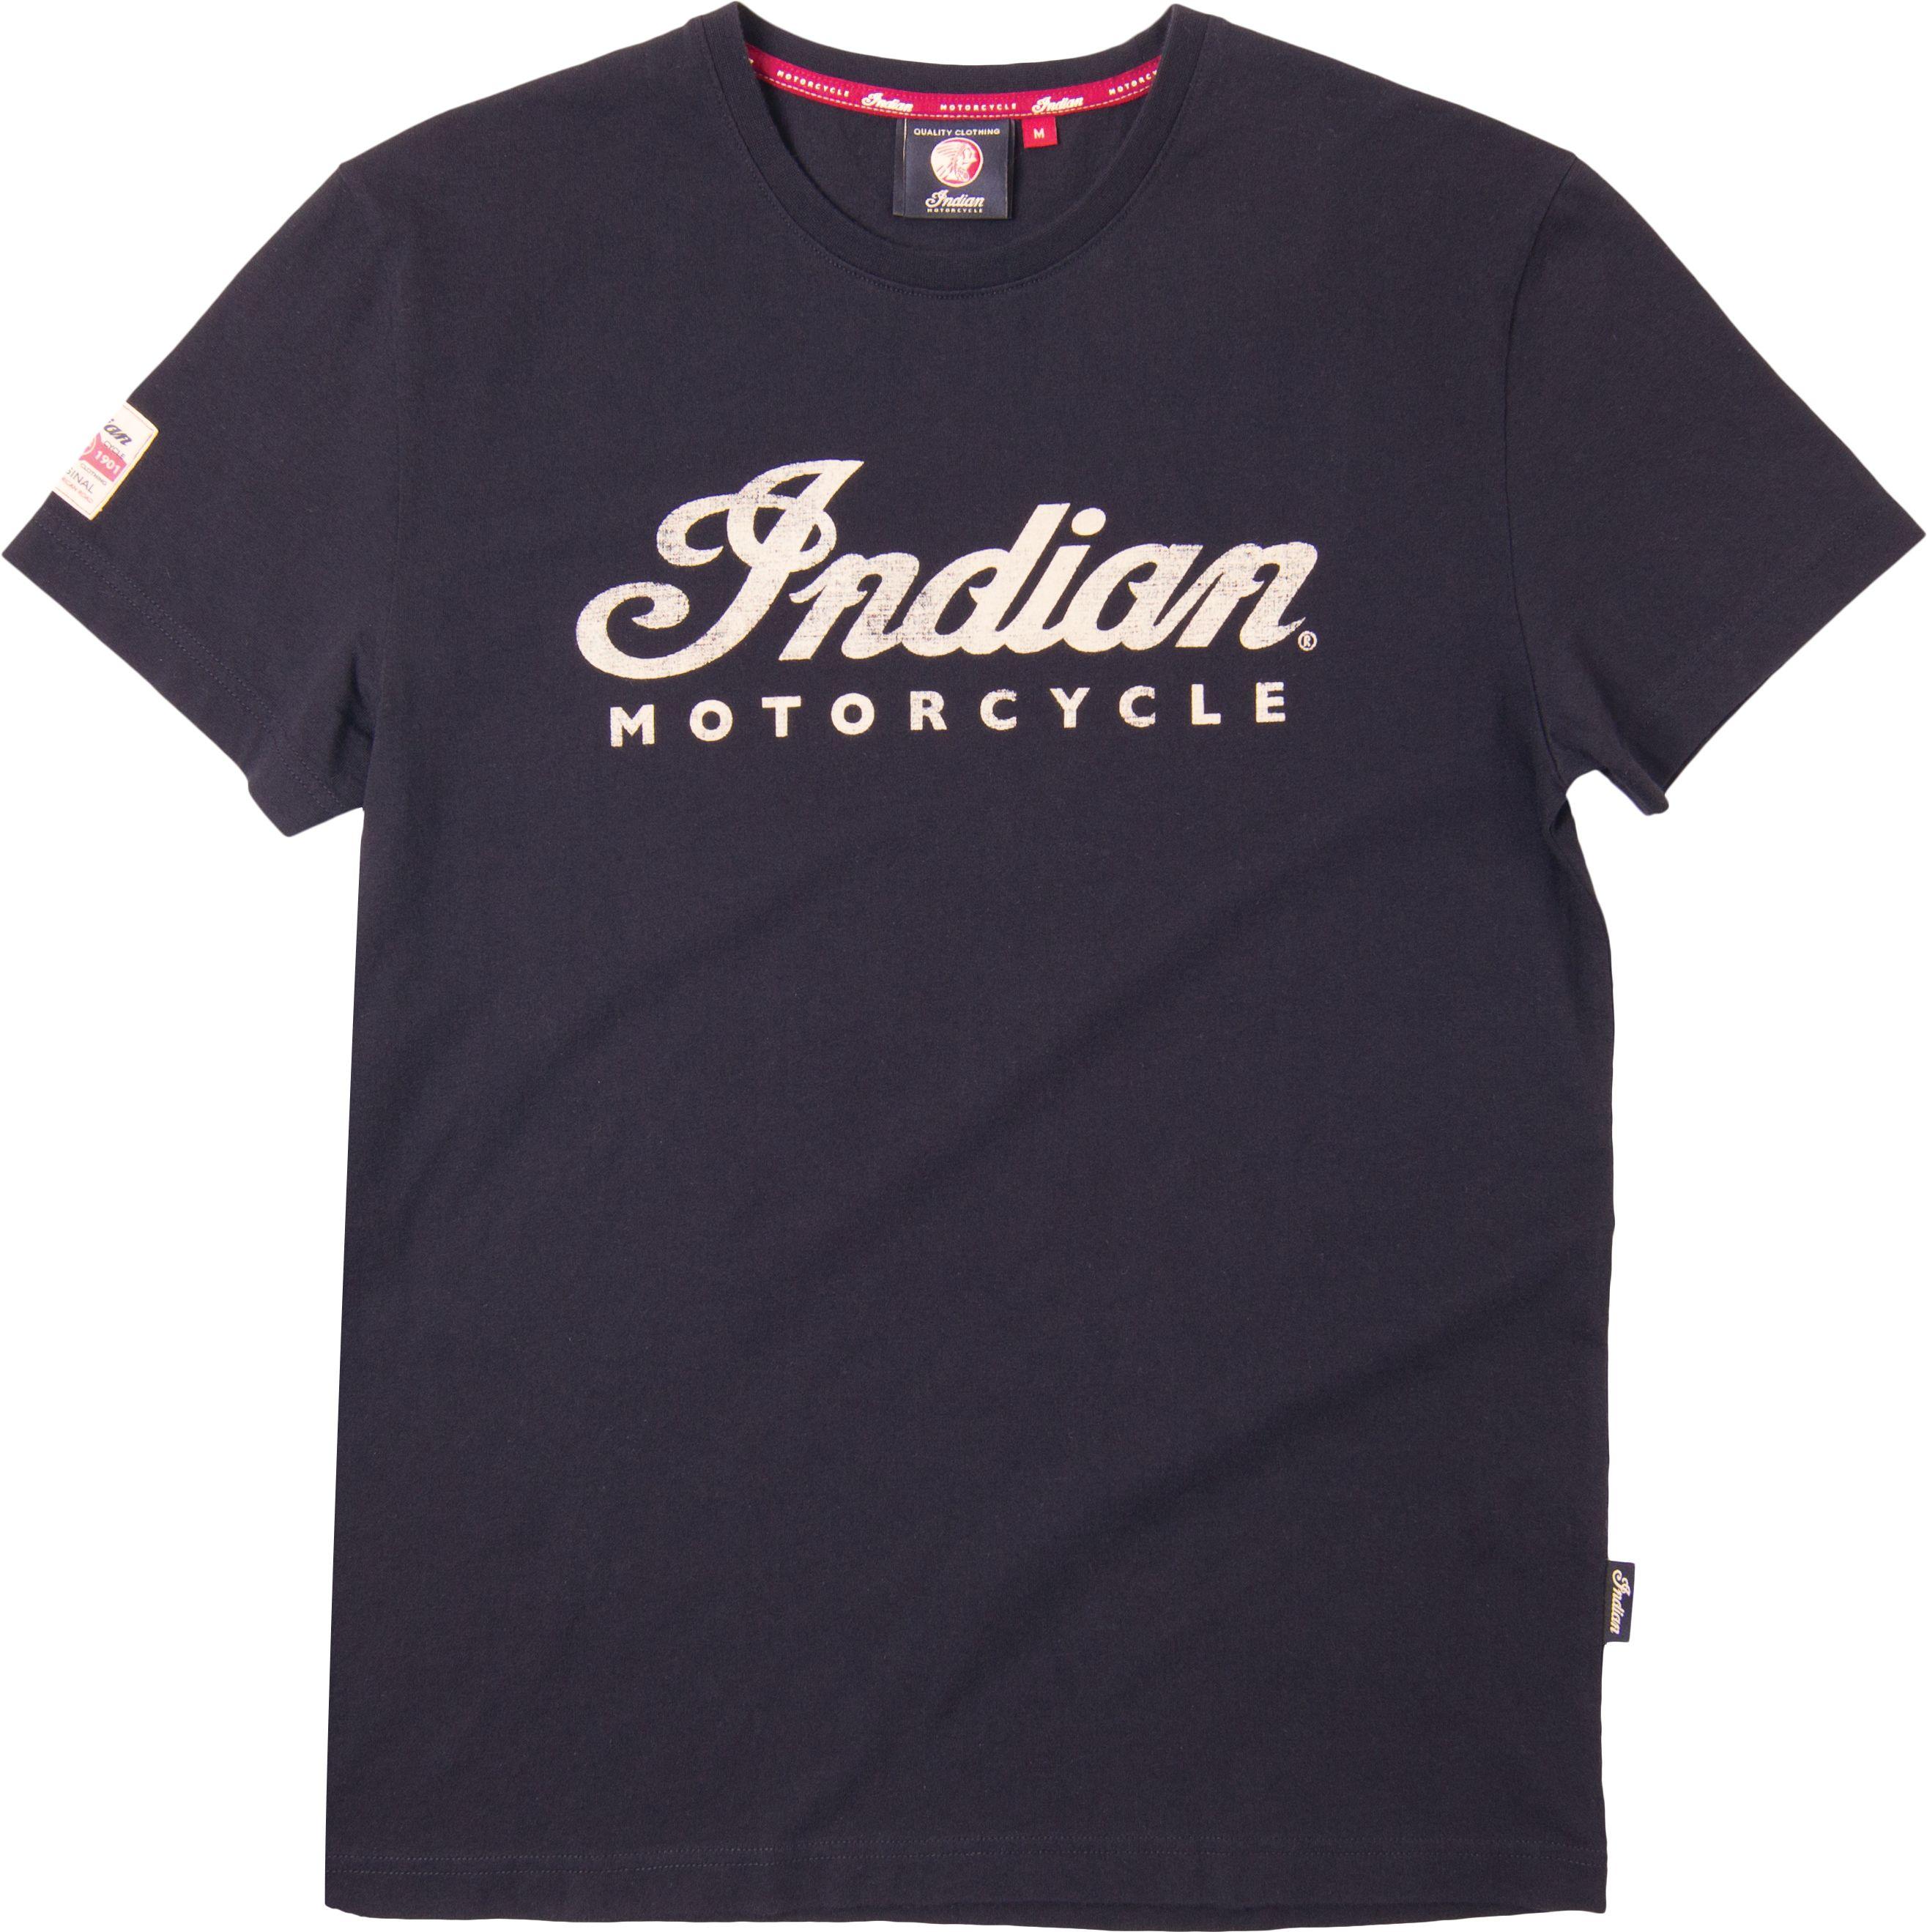 Tee Ecru Logo Indian Motorcycle TShirt Indian